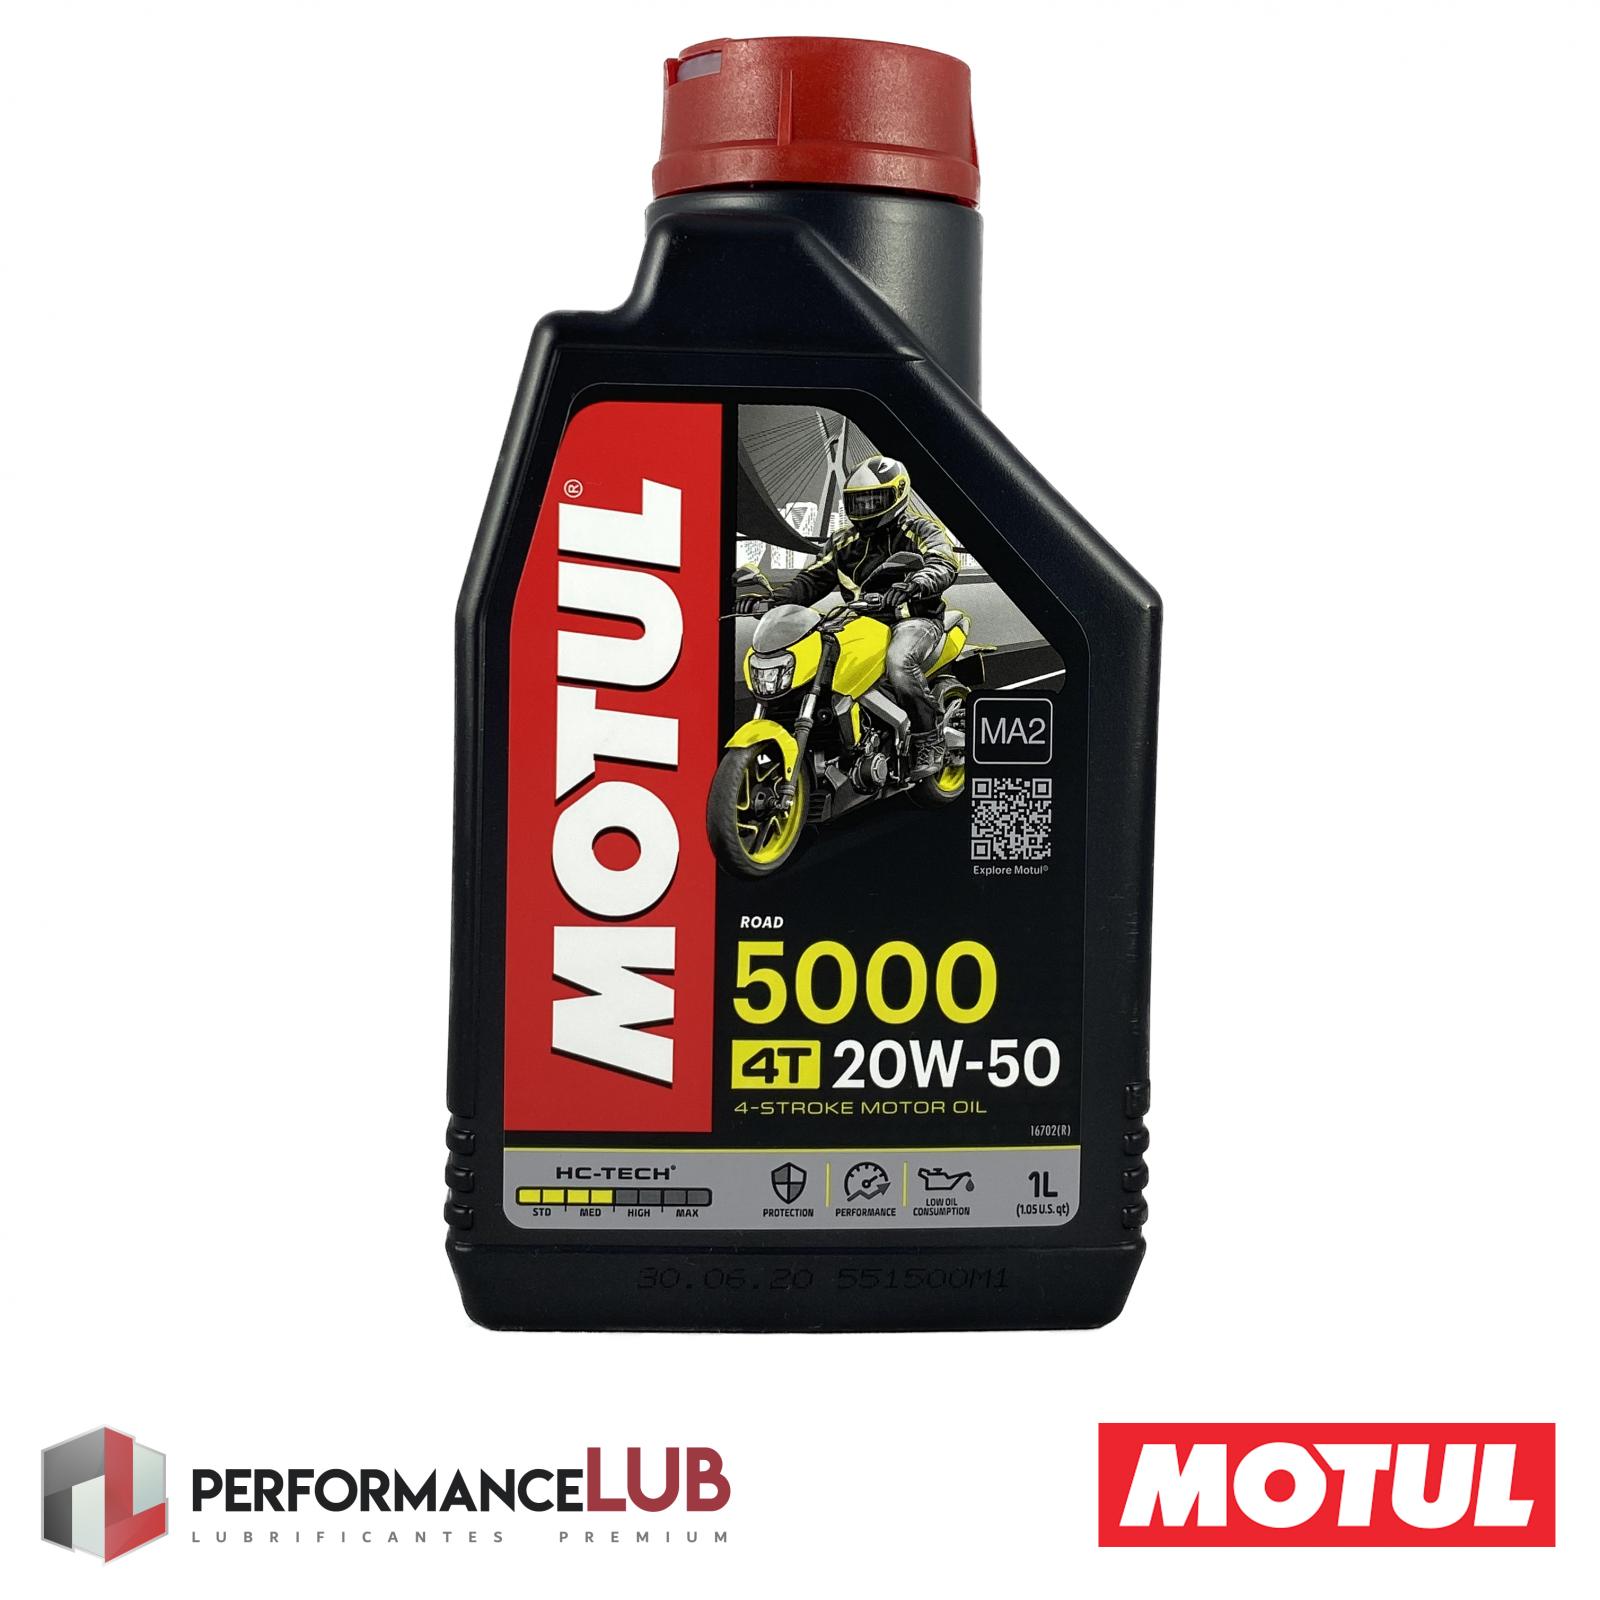 5000 4T 20W50 - JASO MA2 - 1 litro - PerformanceLUB Lubrificantes Premium